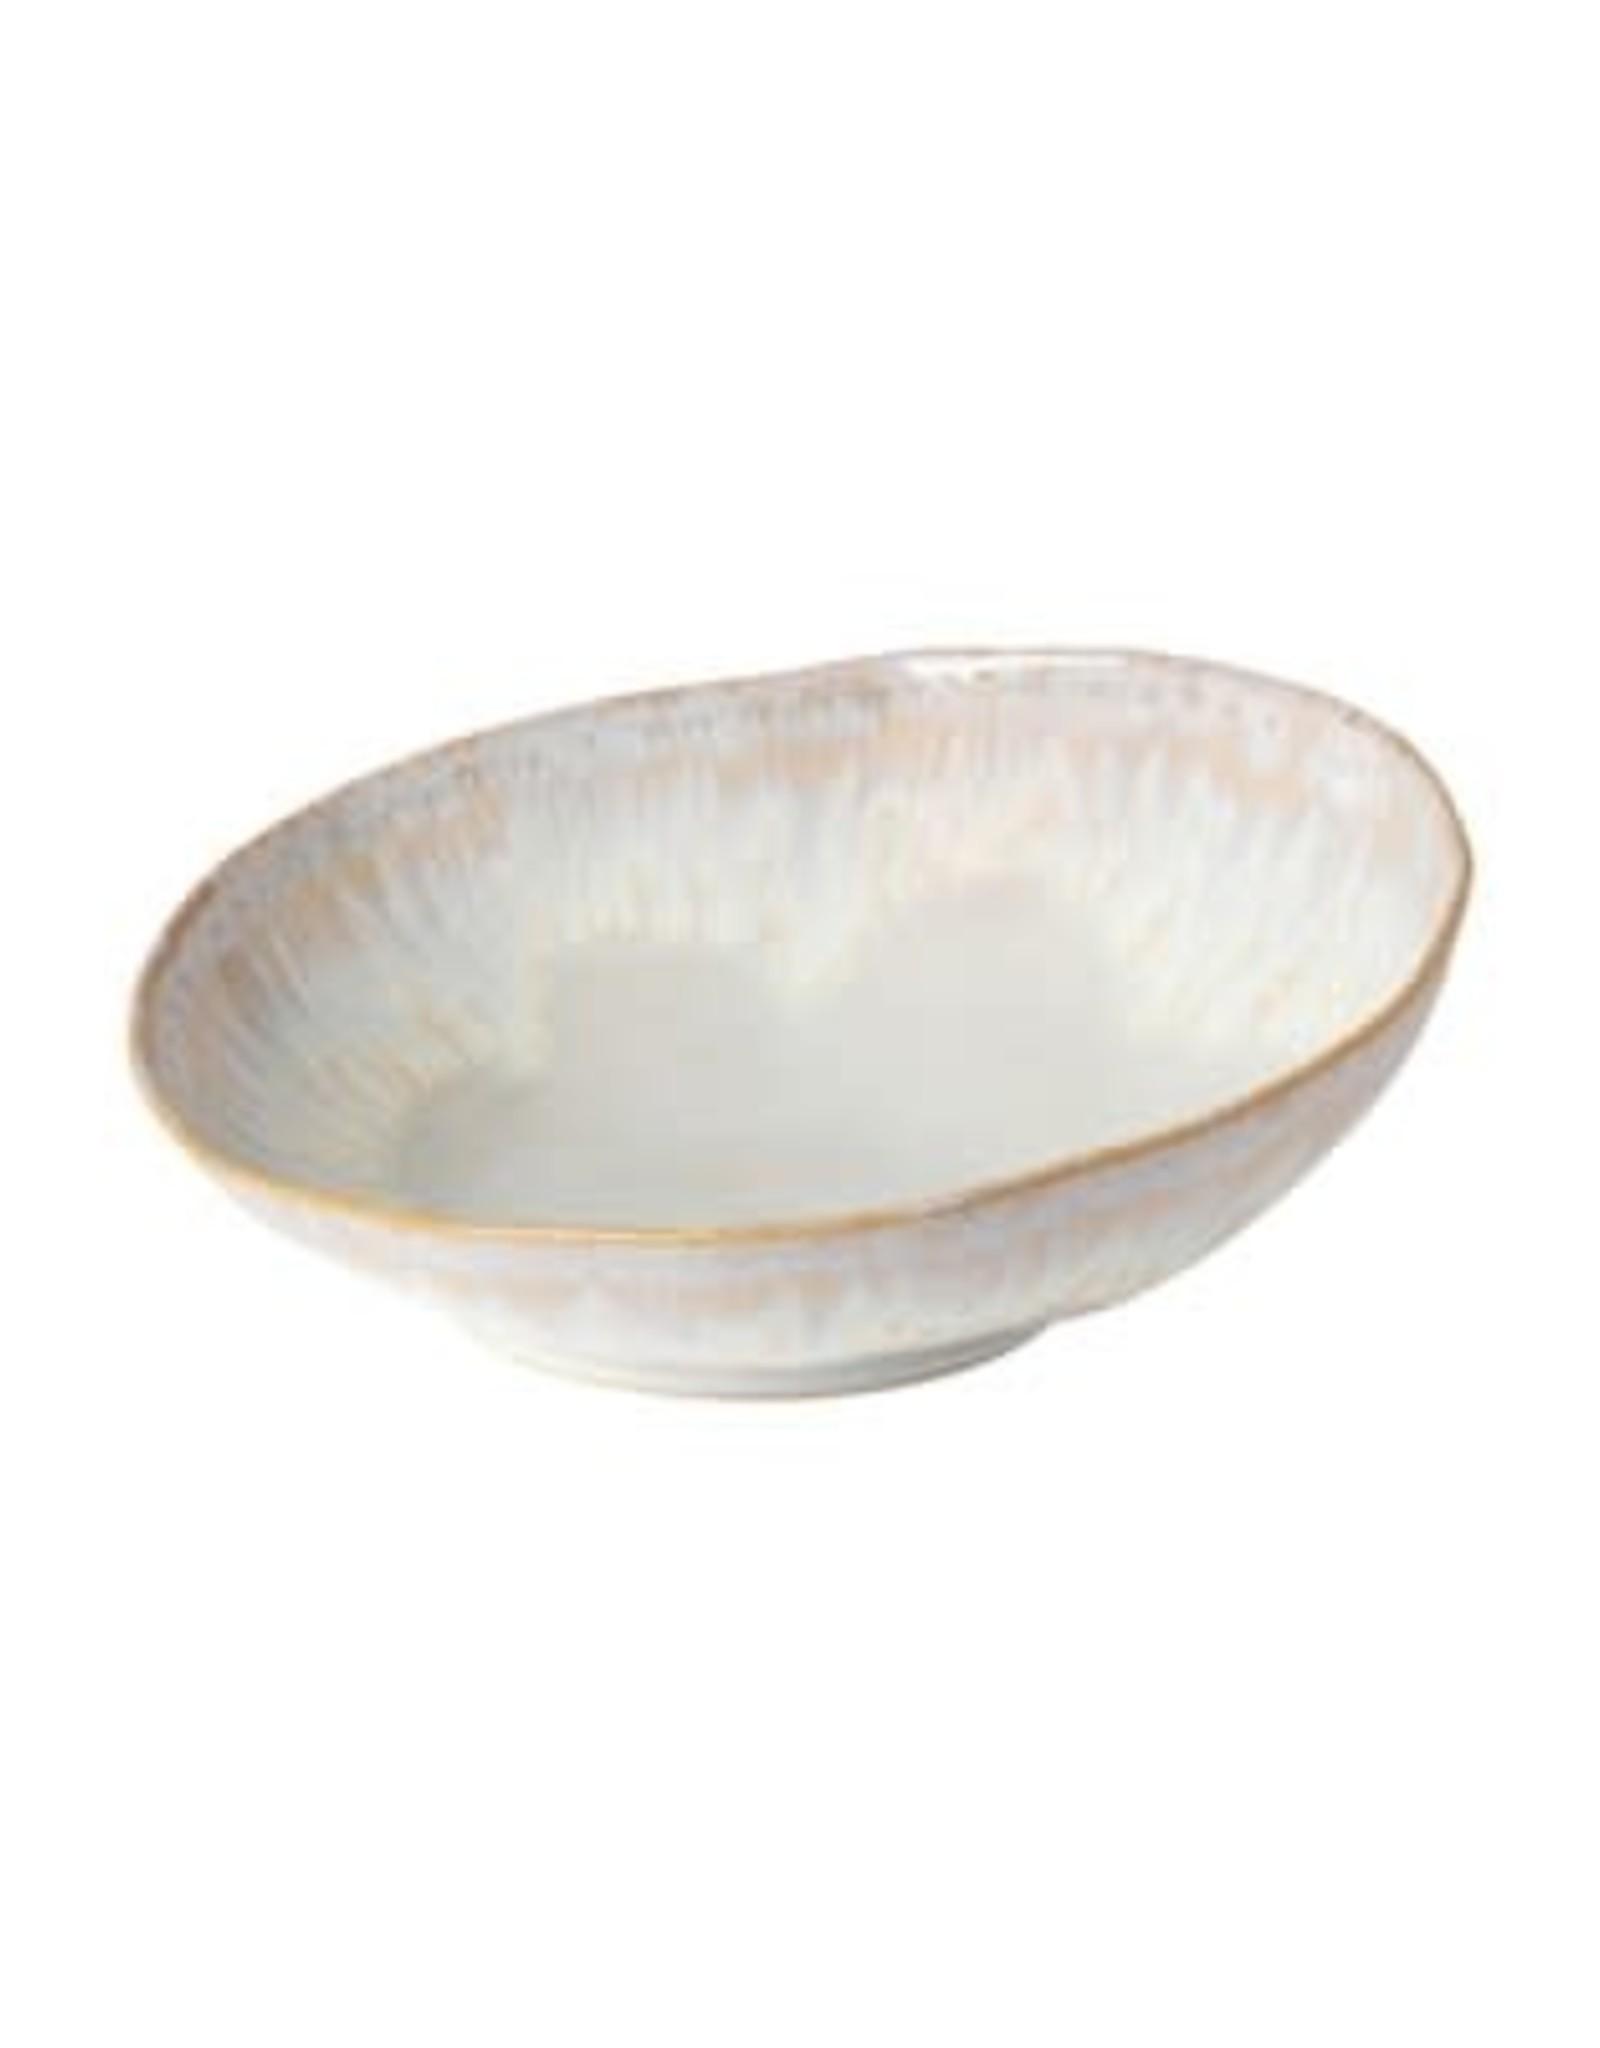 "Brisa Salt Serving Bowl D9.25"" H3.25"""